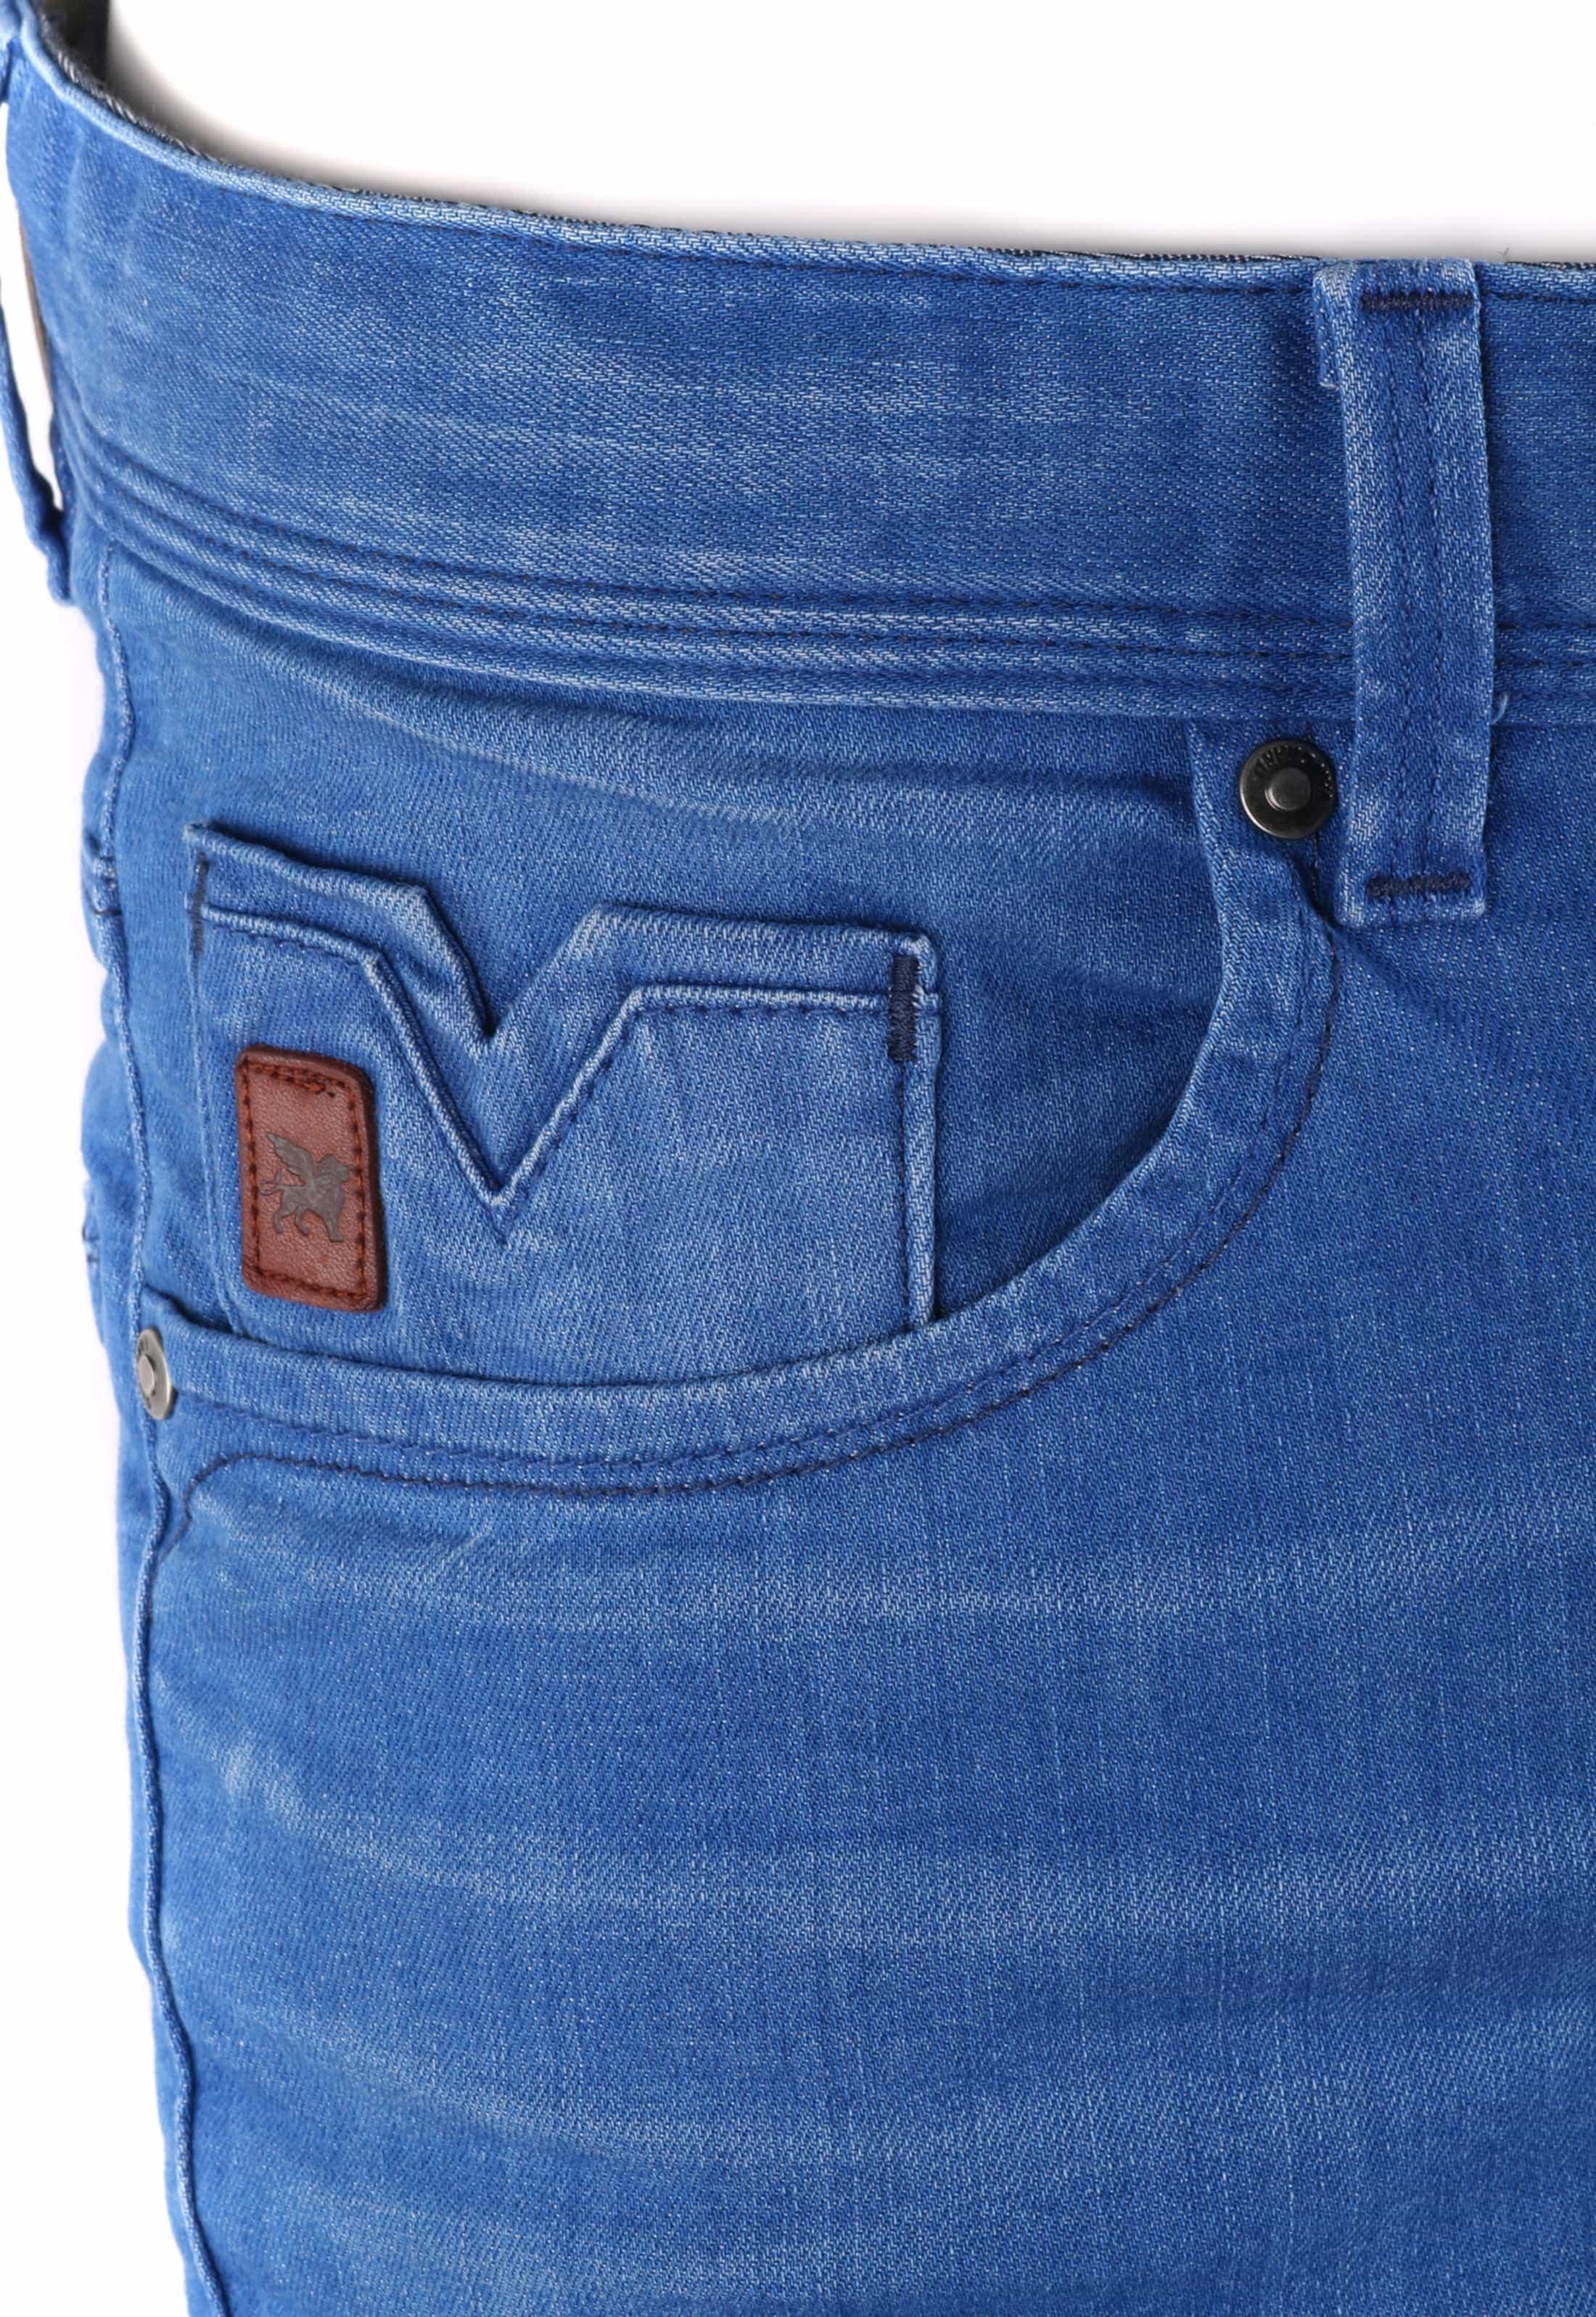 Vanguard V7 Rider Jeans Blue foto 4